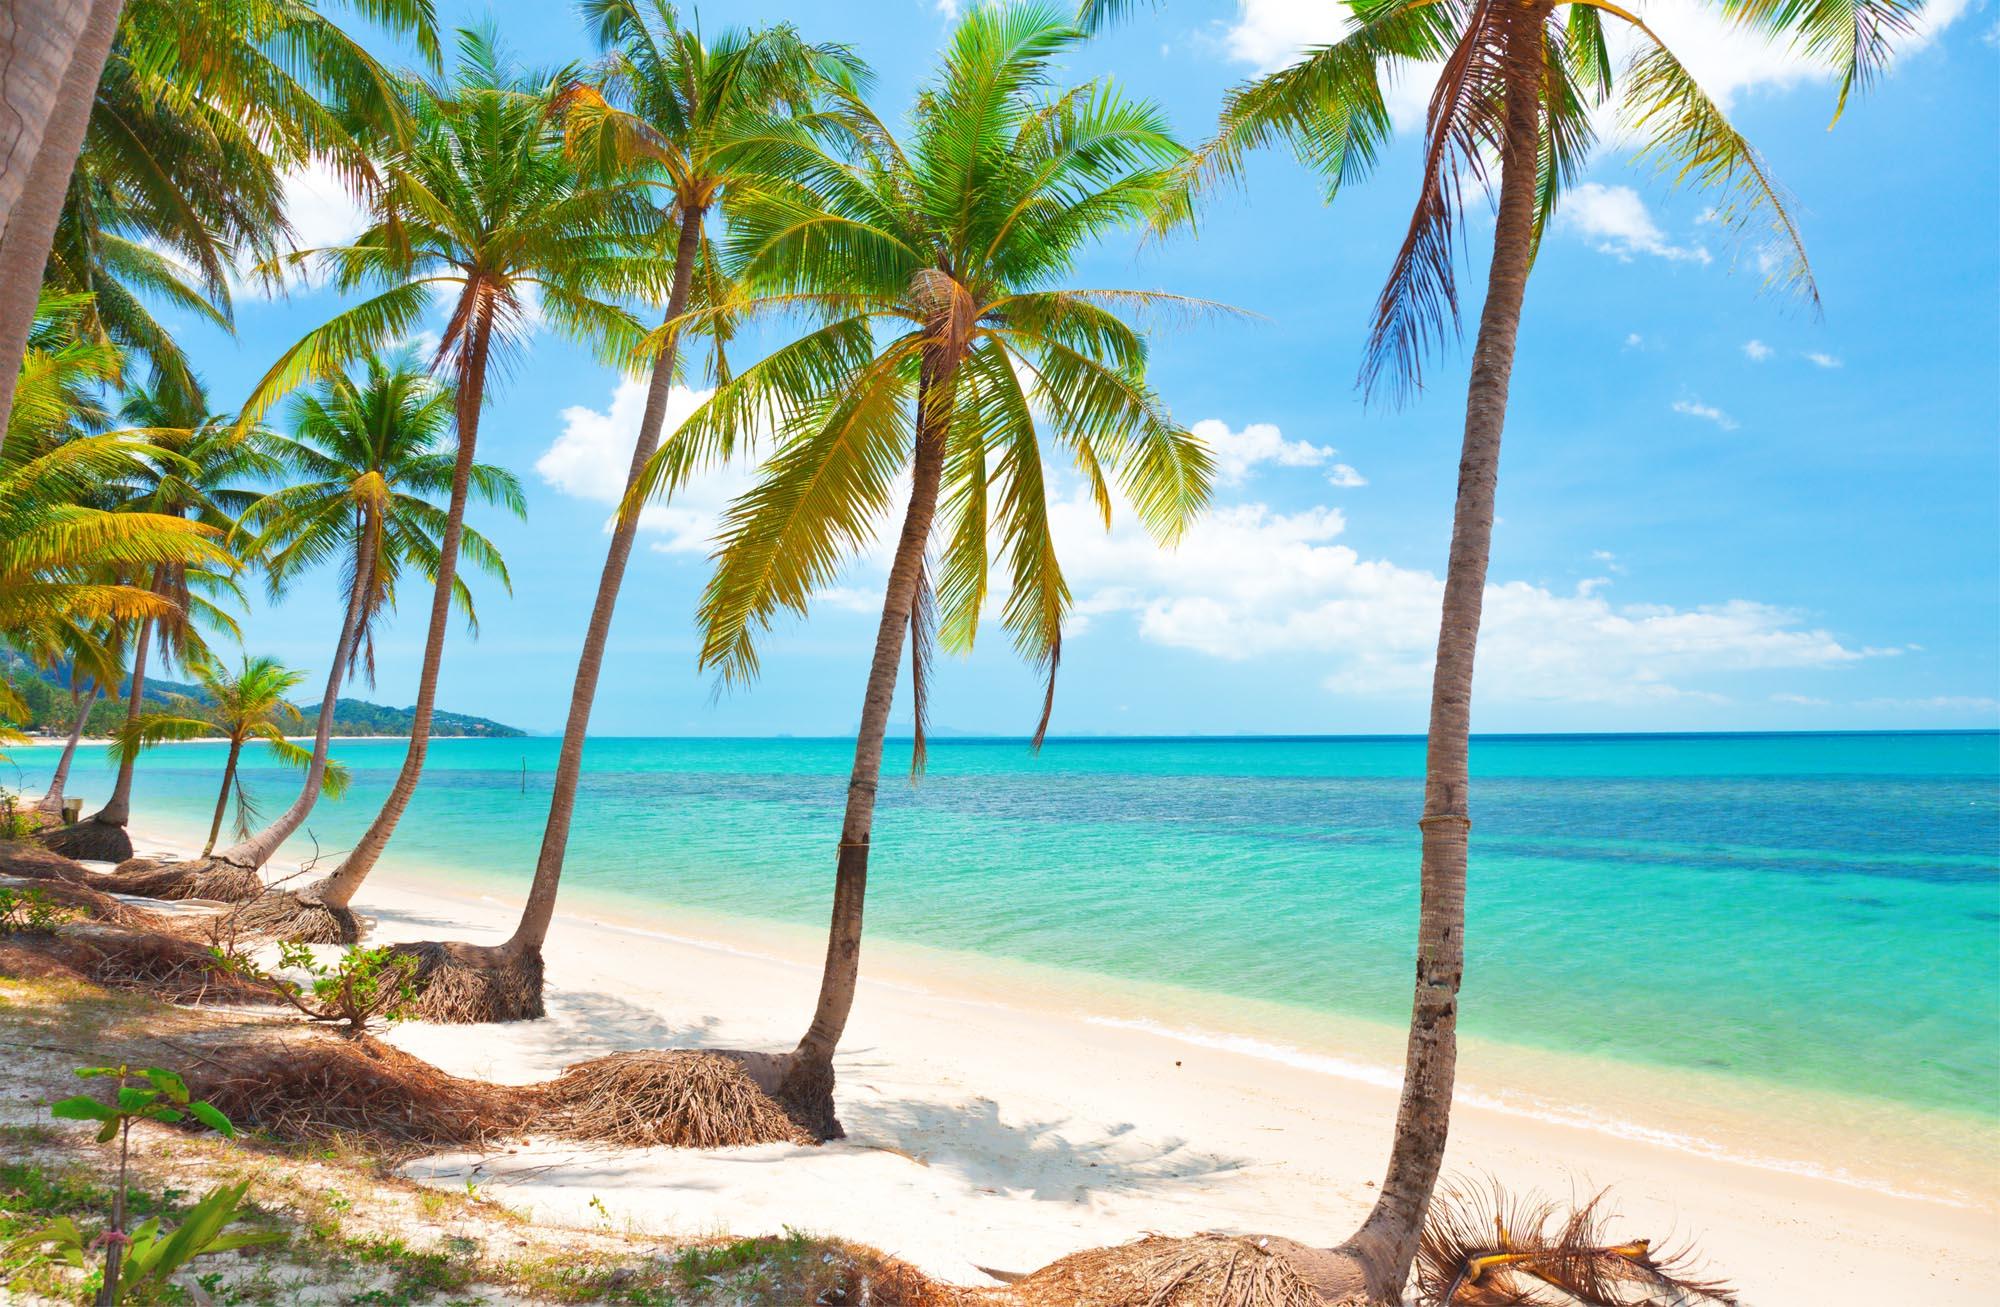 Barefoot Luxury Thai Island Escape Holidays